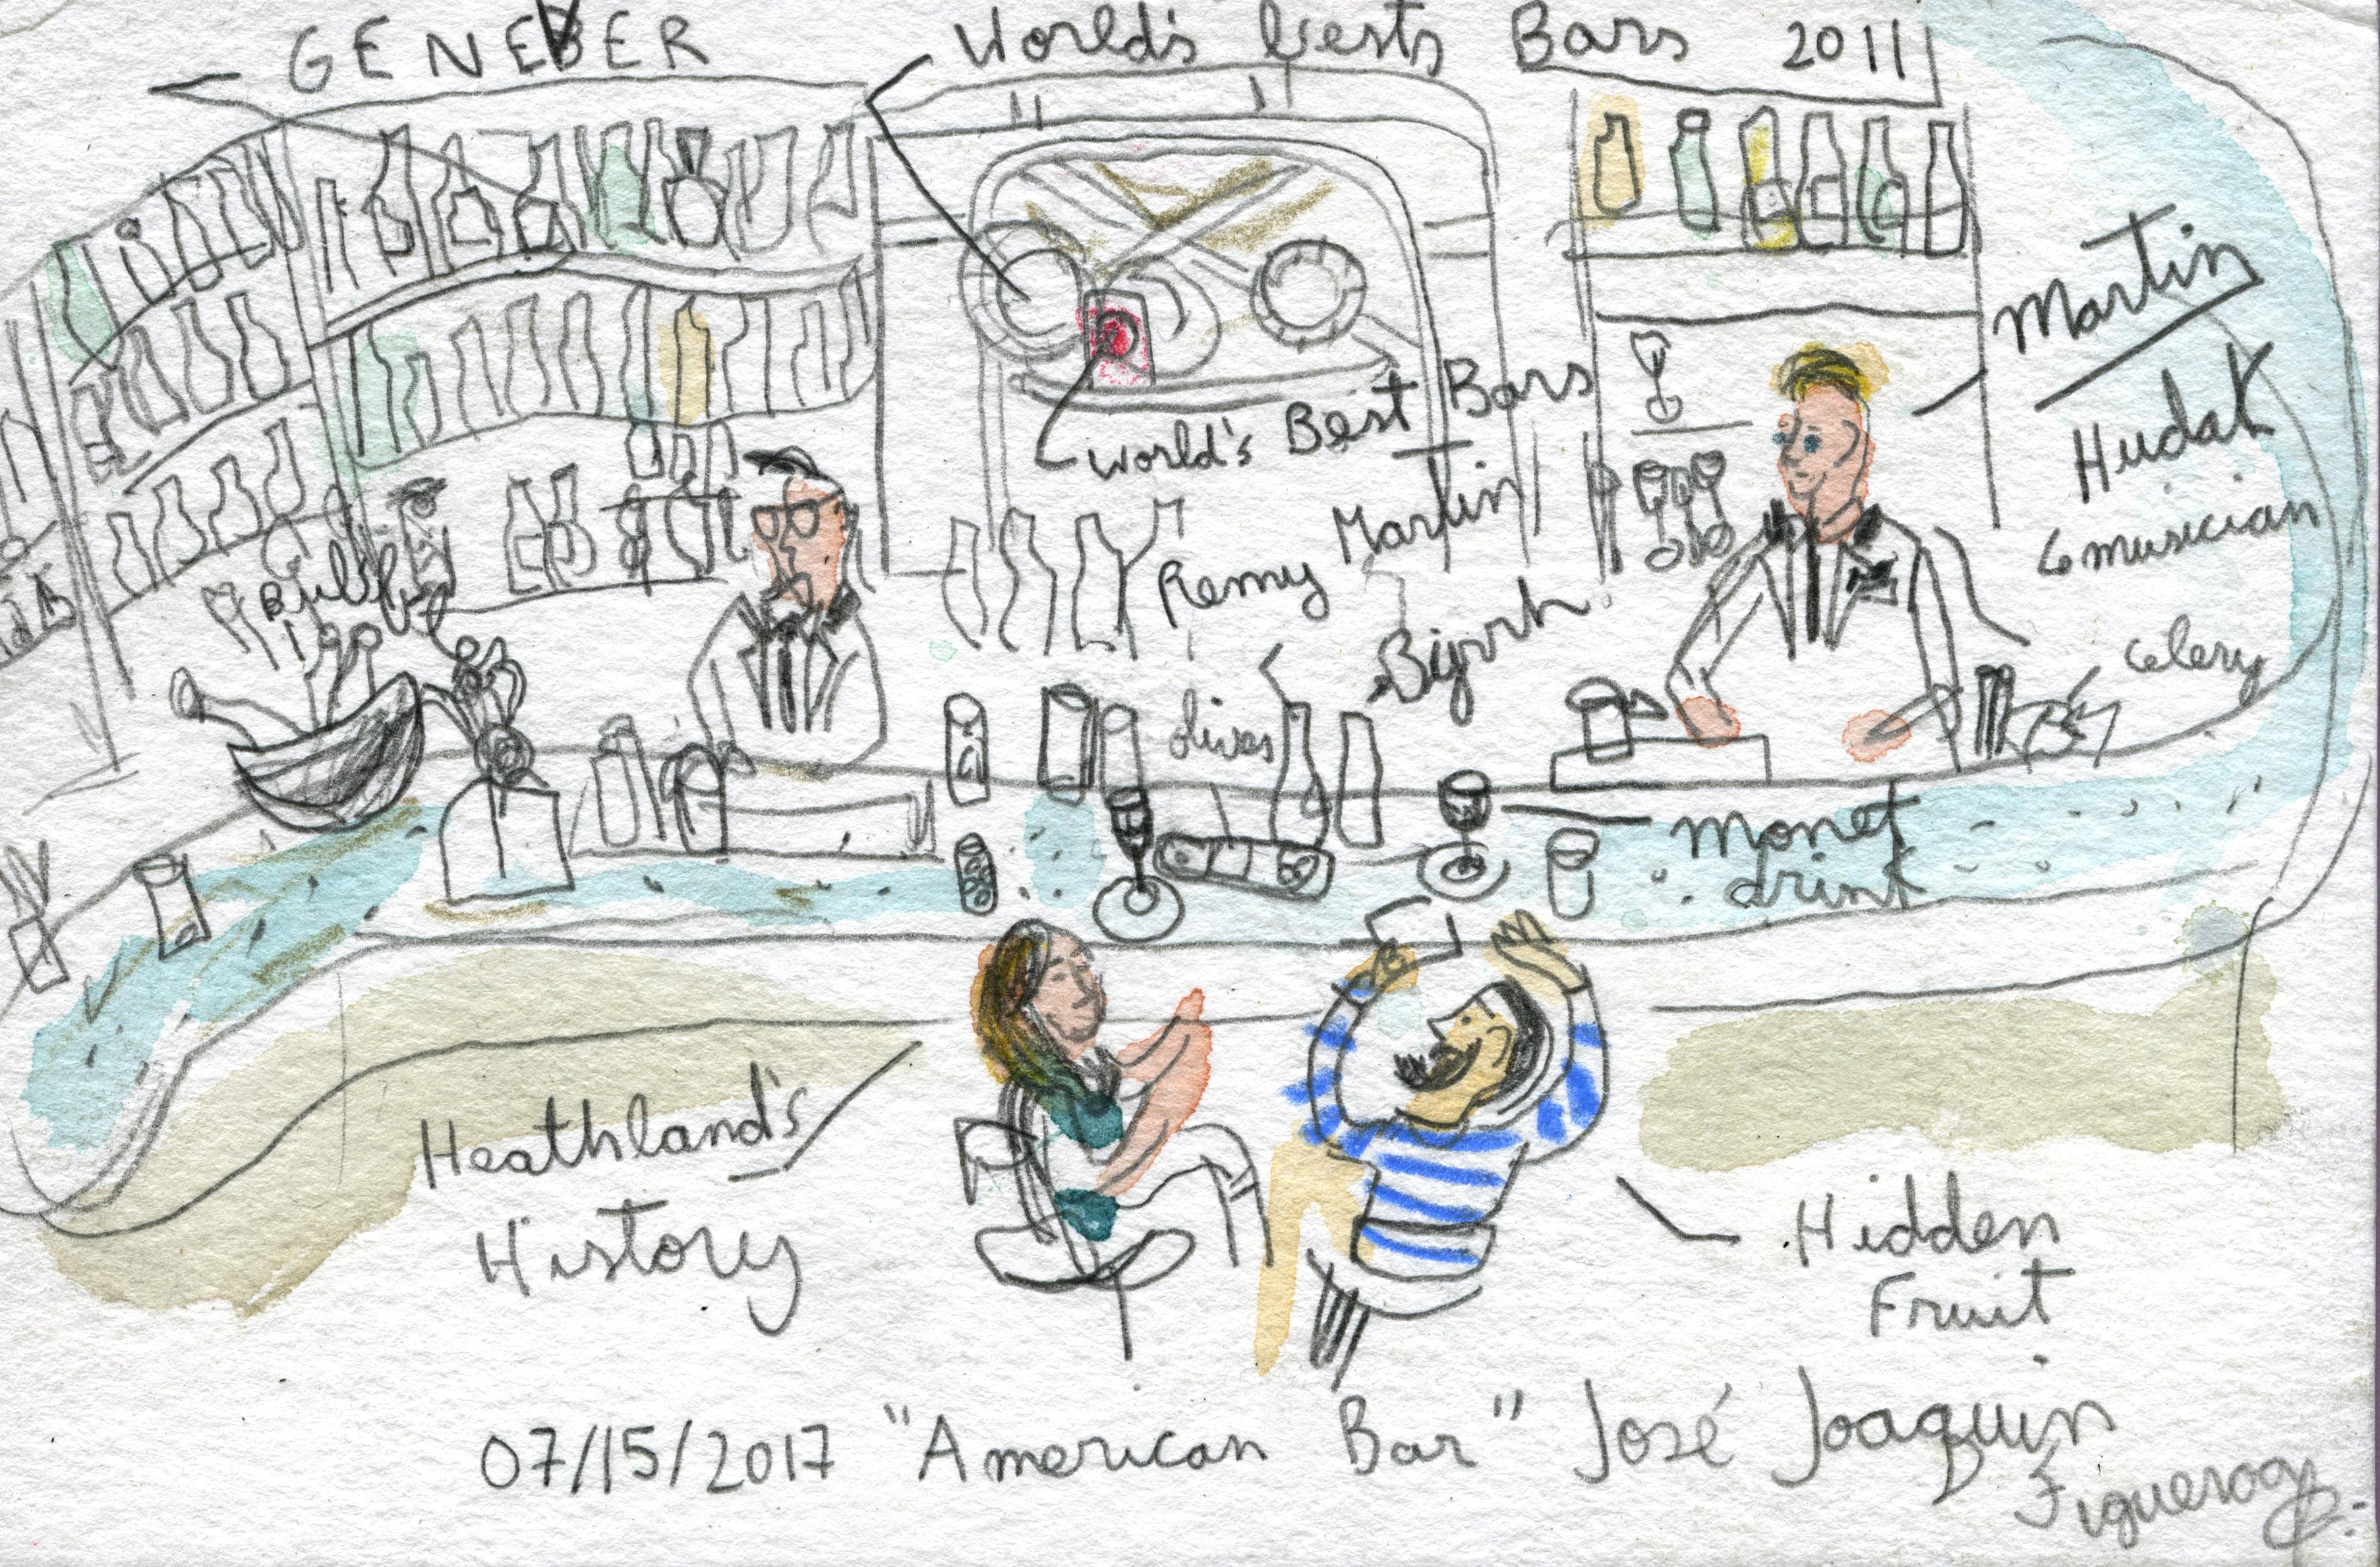 07-15-2017 american bar